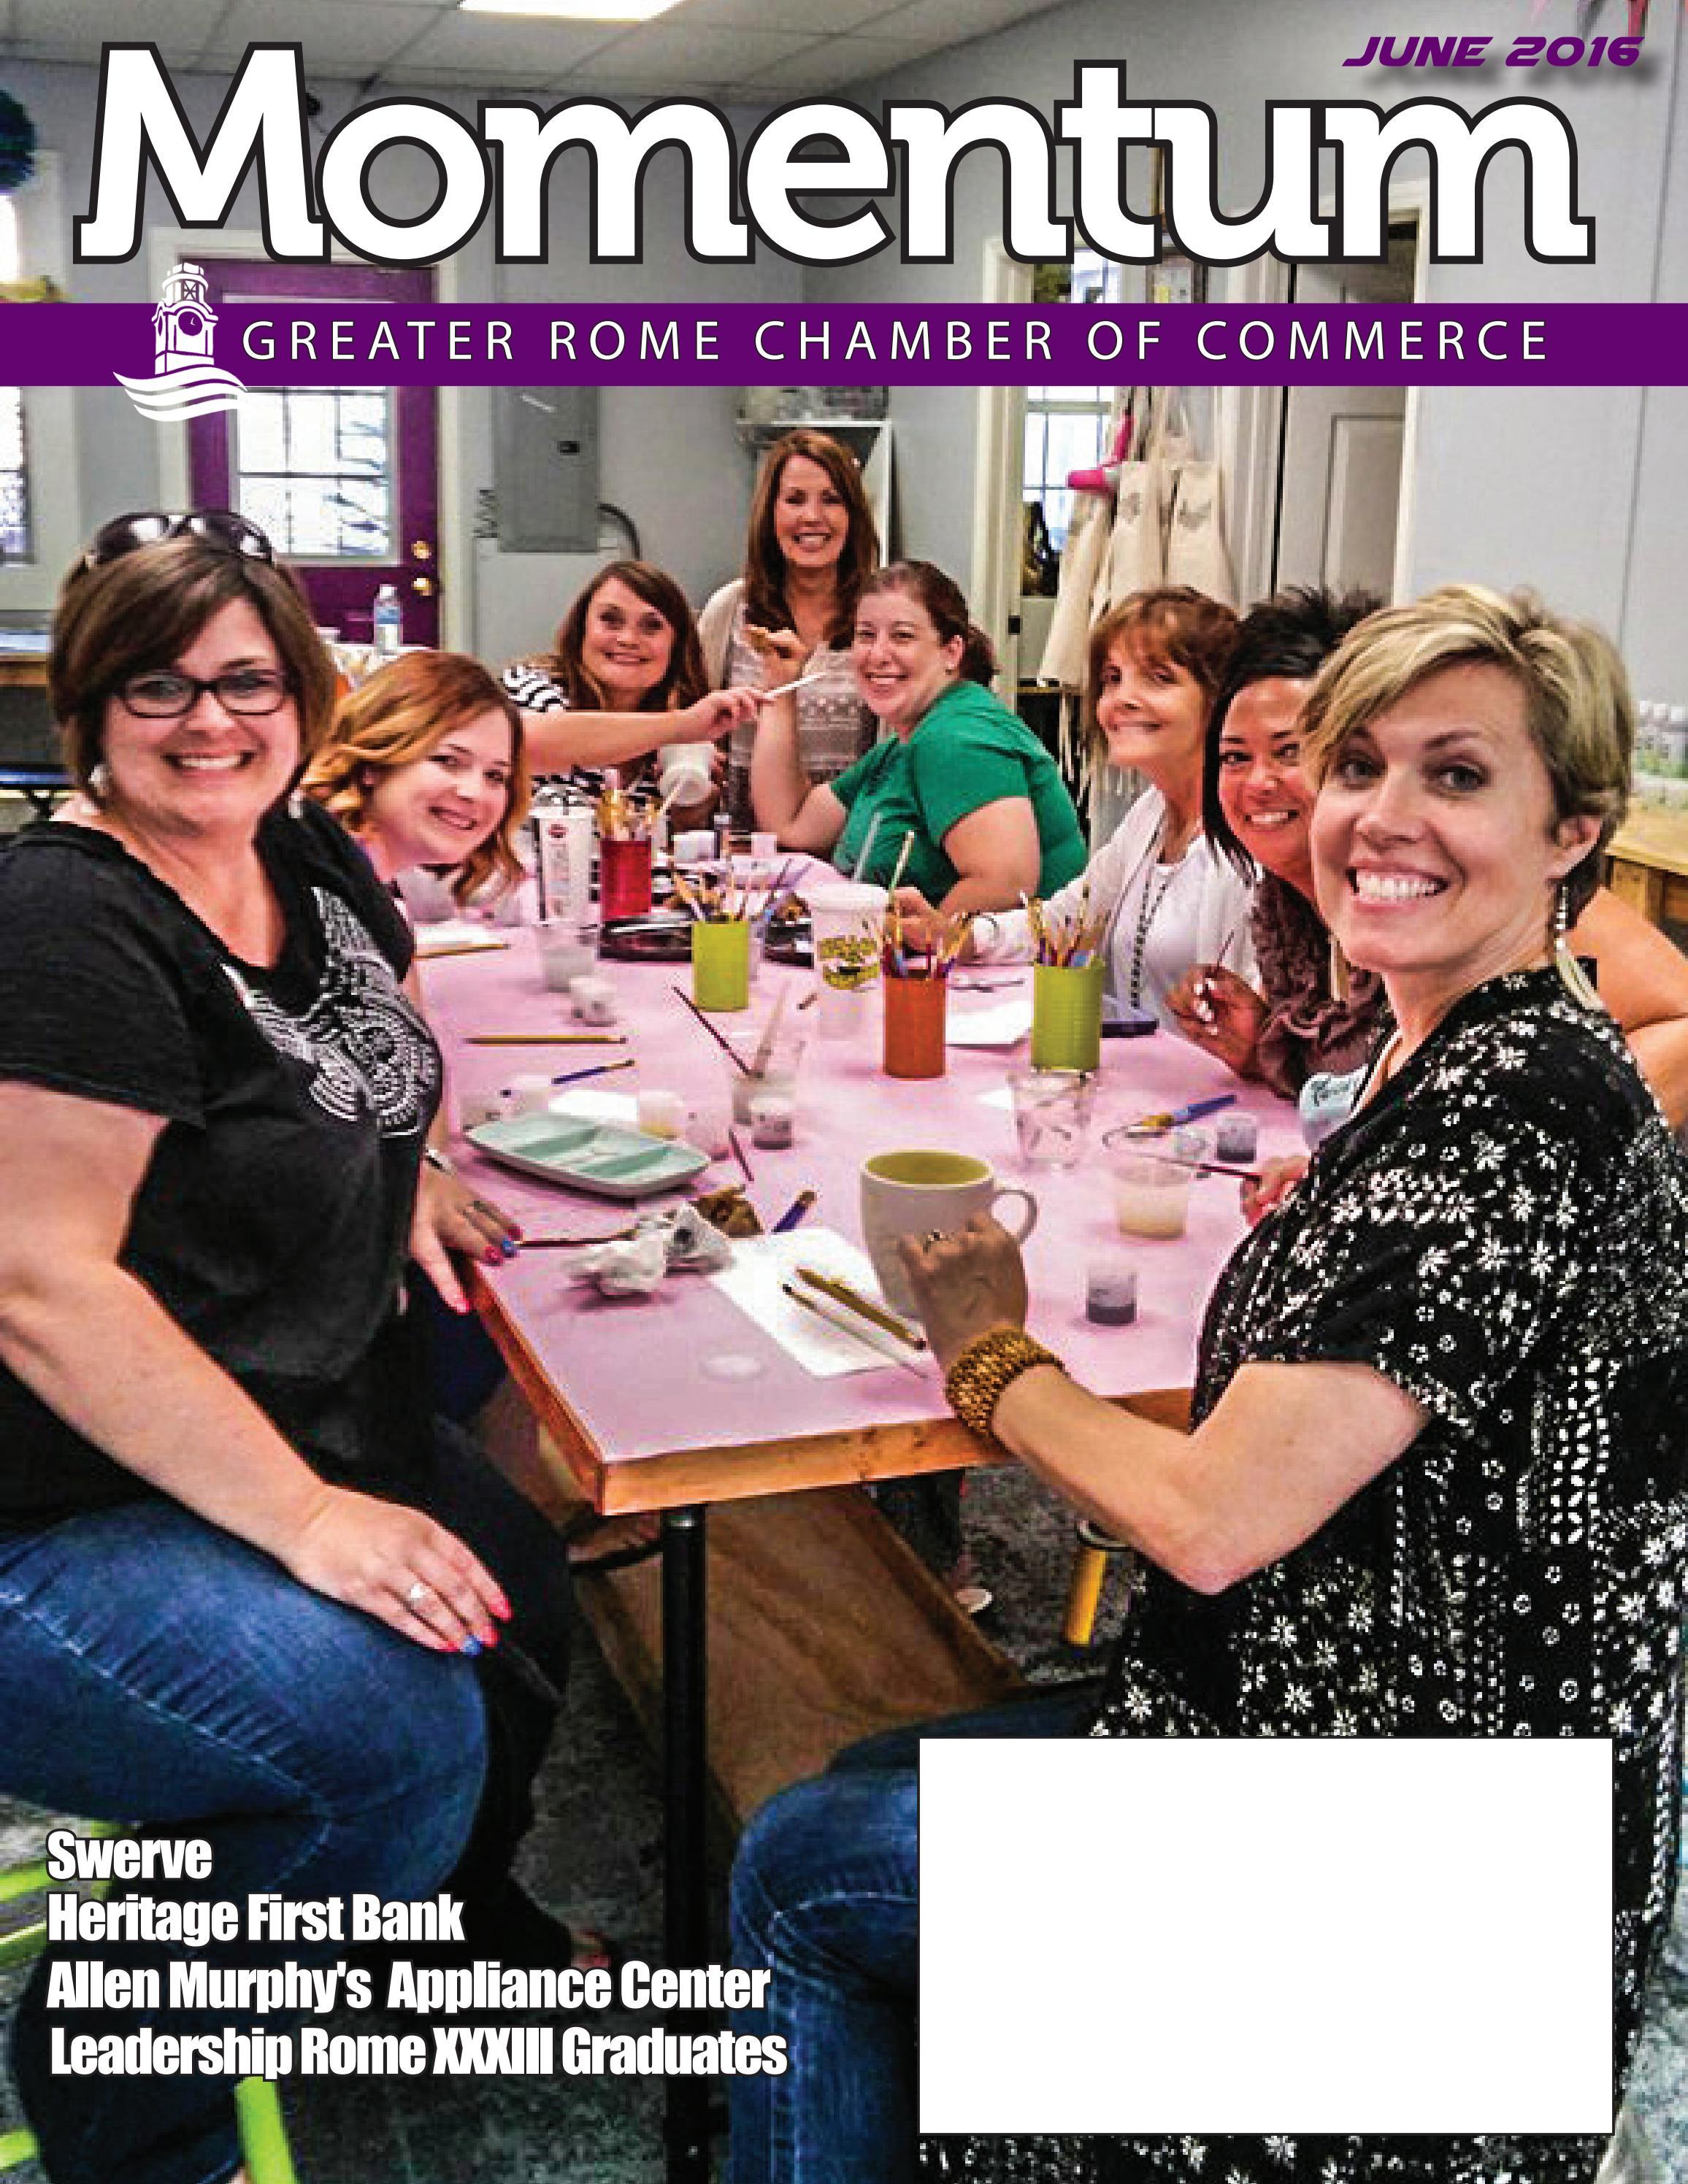 Good shepherd funeral home rome ga - June 2016 Momentum Magazine By Greater Rome Chamber Of Commerce Issuu